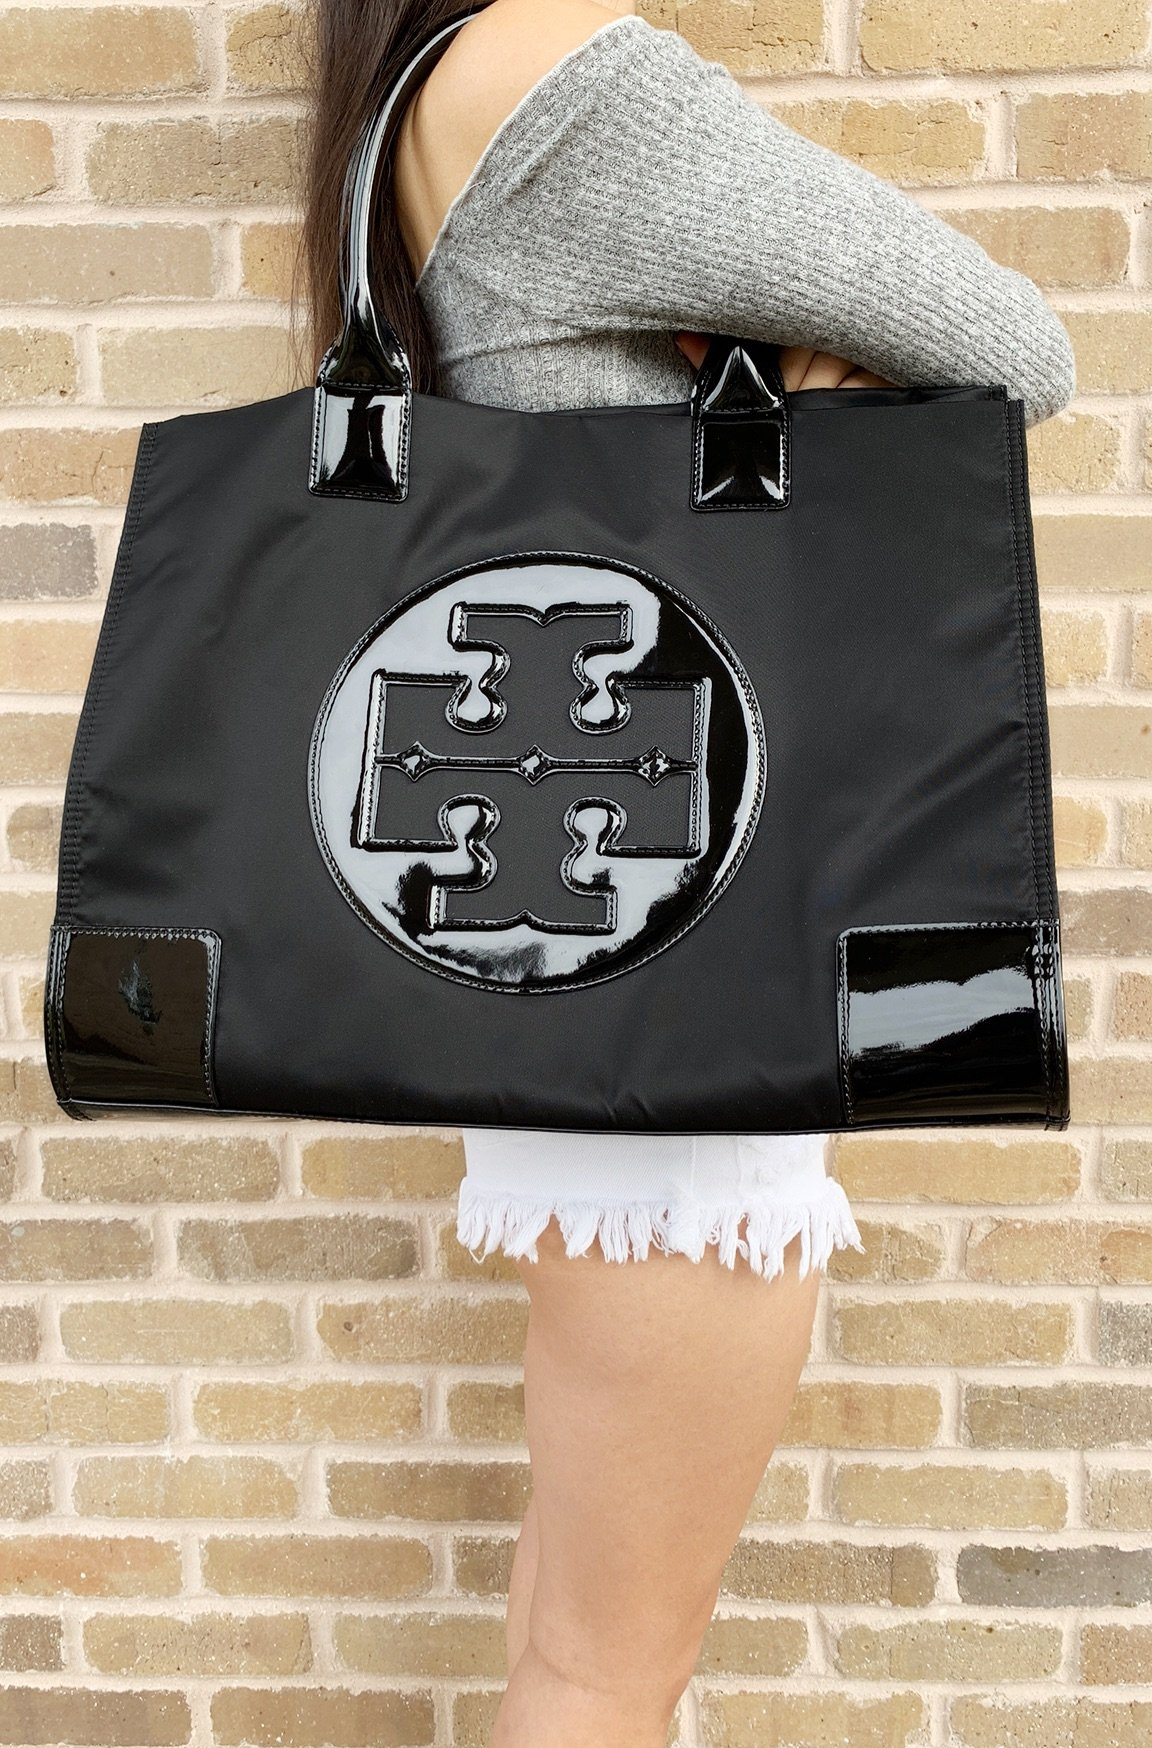 1b7cbc97a581 Tory Burch Ella Large Tote Black Nylon Patent Leather 885427179320 ...